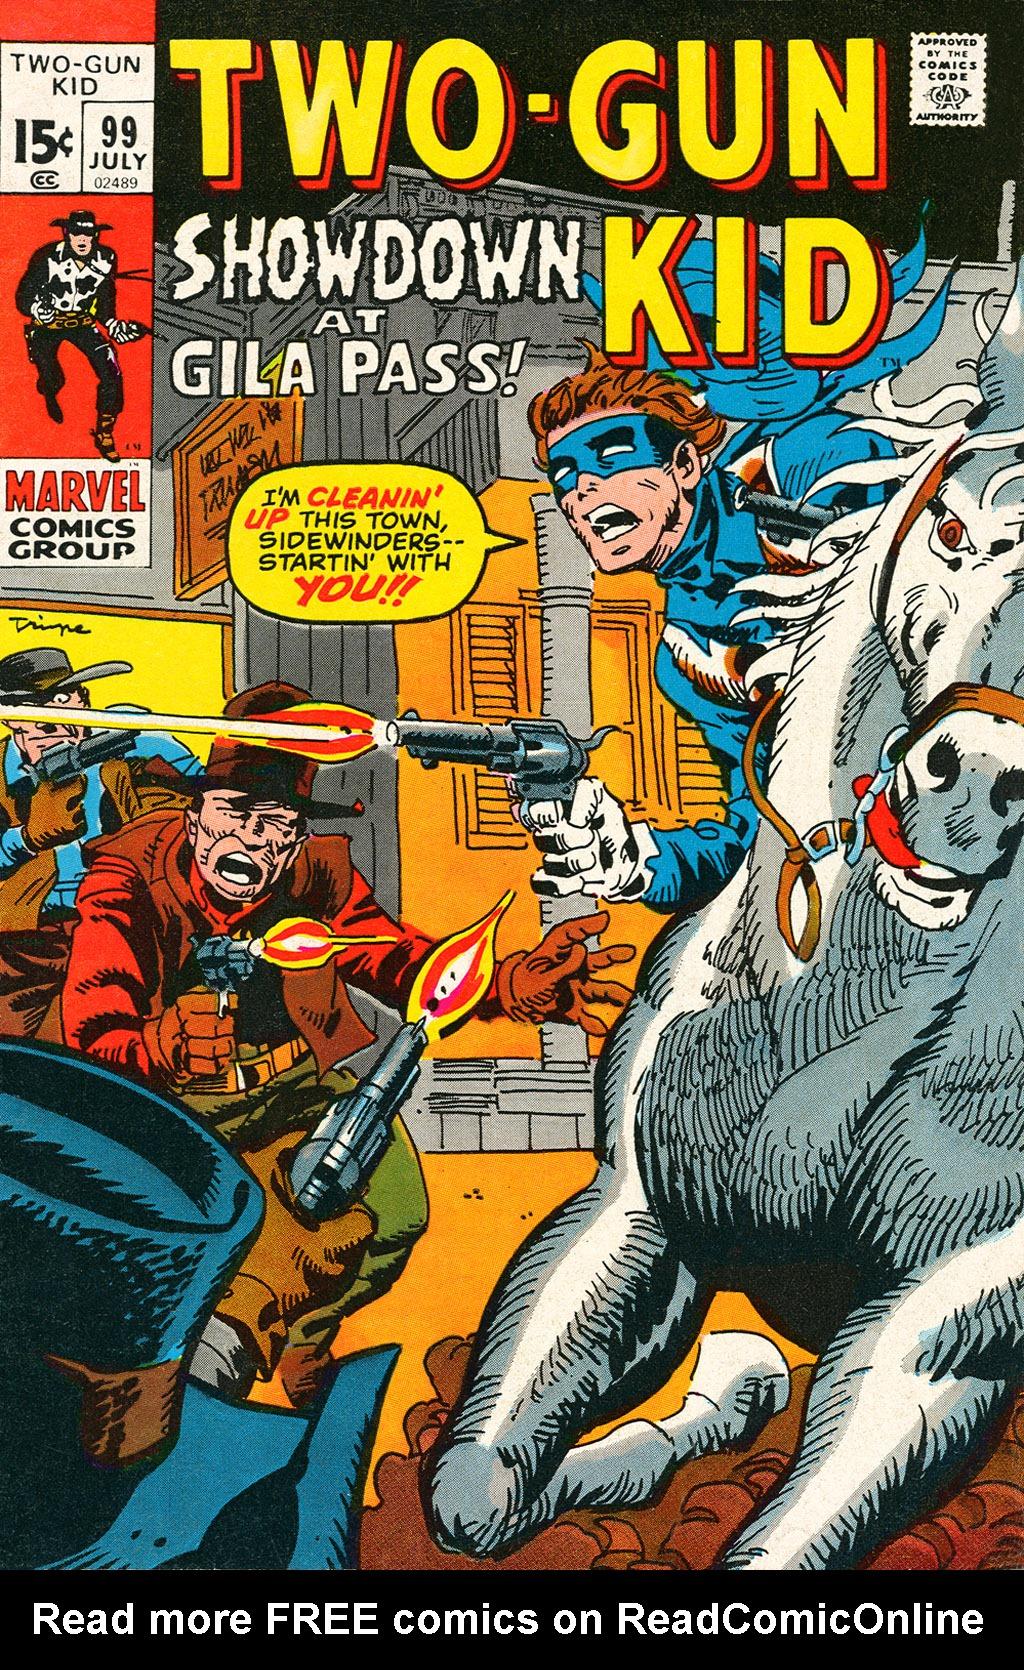 Read online Two-Gun Kid comic -  Issue #99 - 1